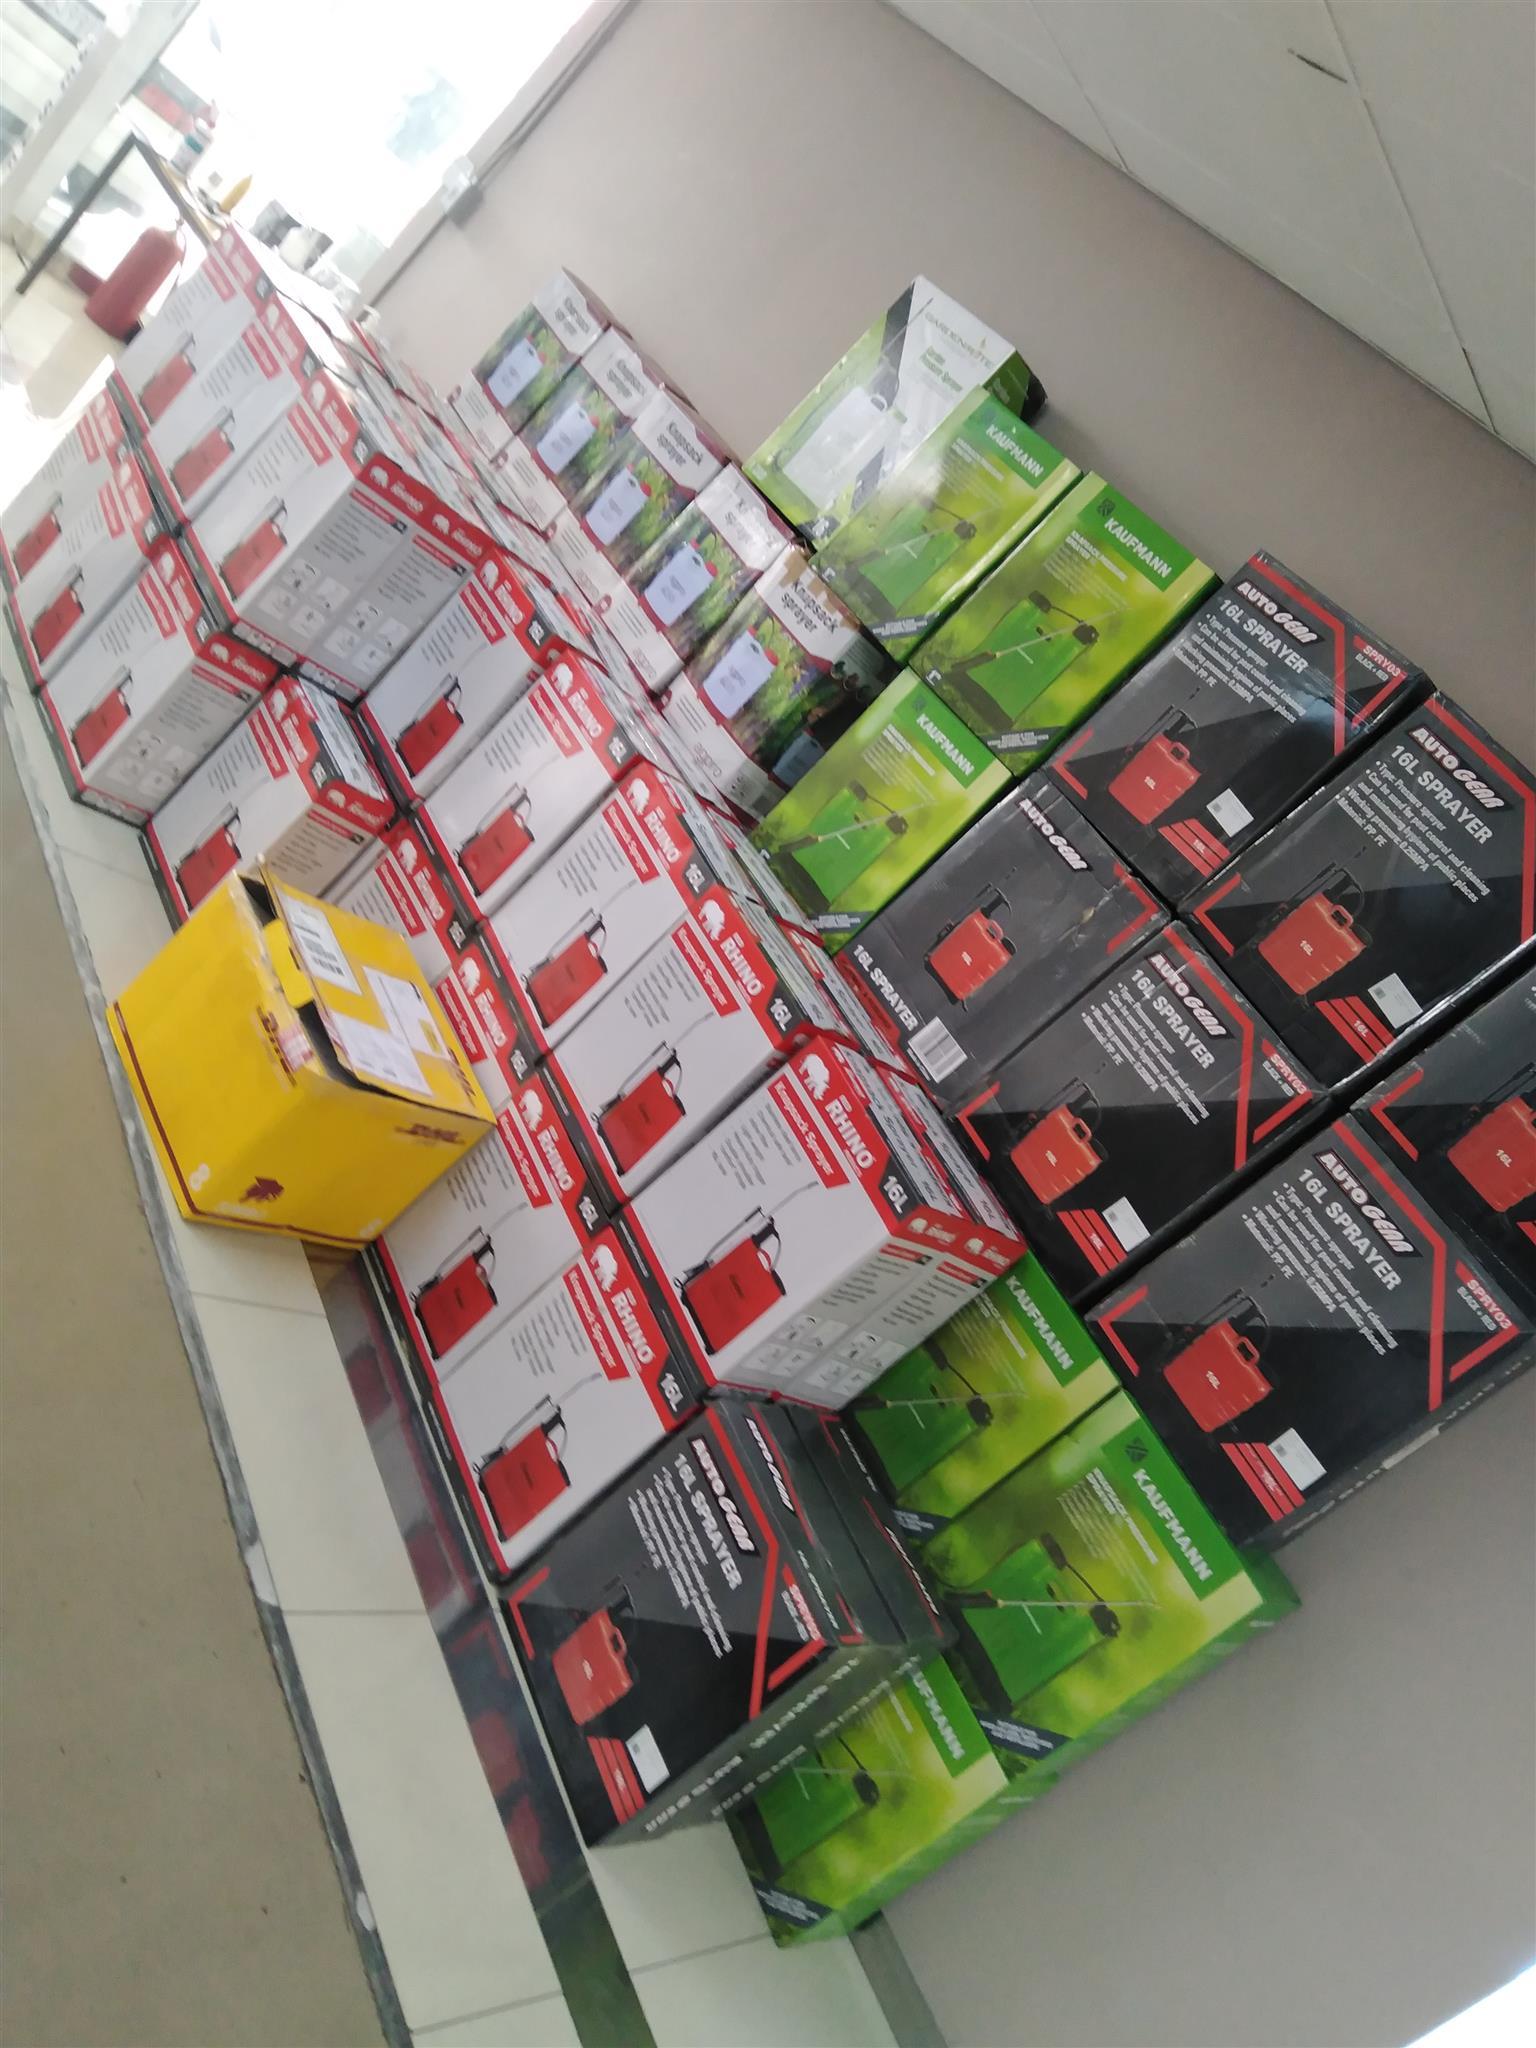 Knapsack sprayers available